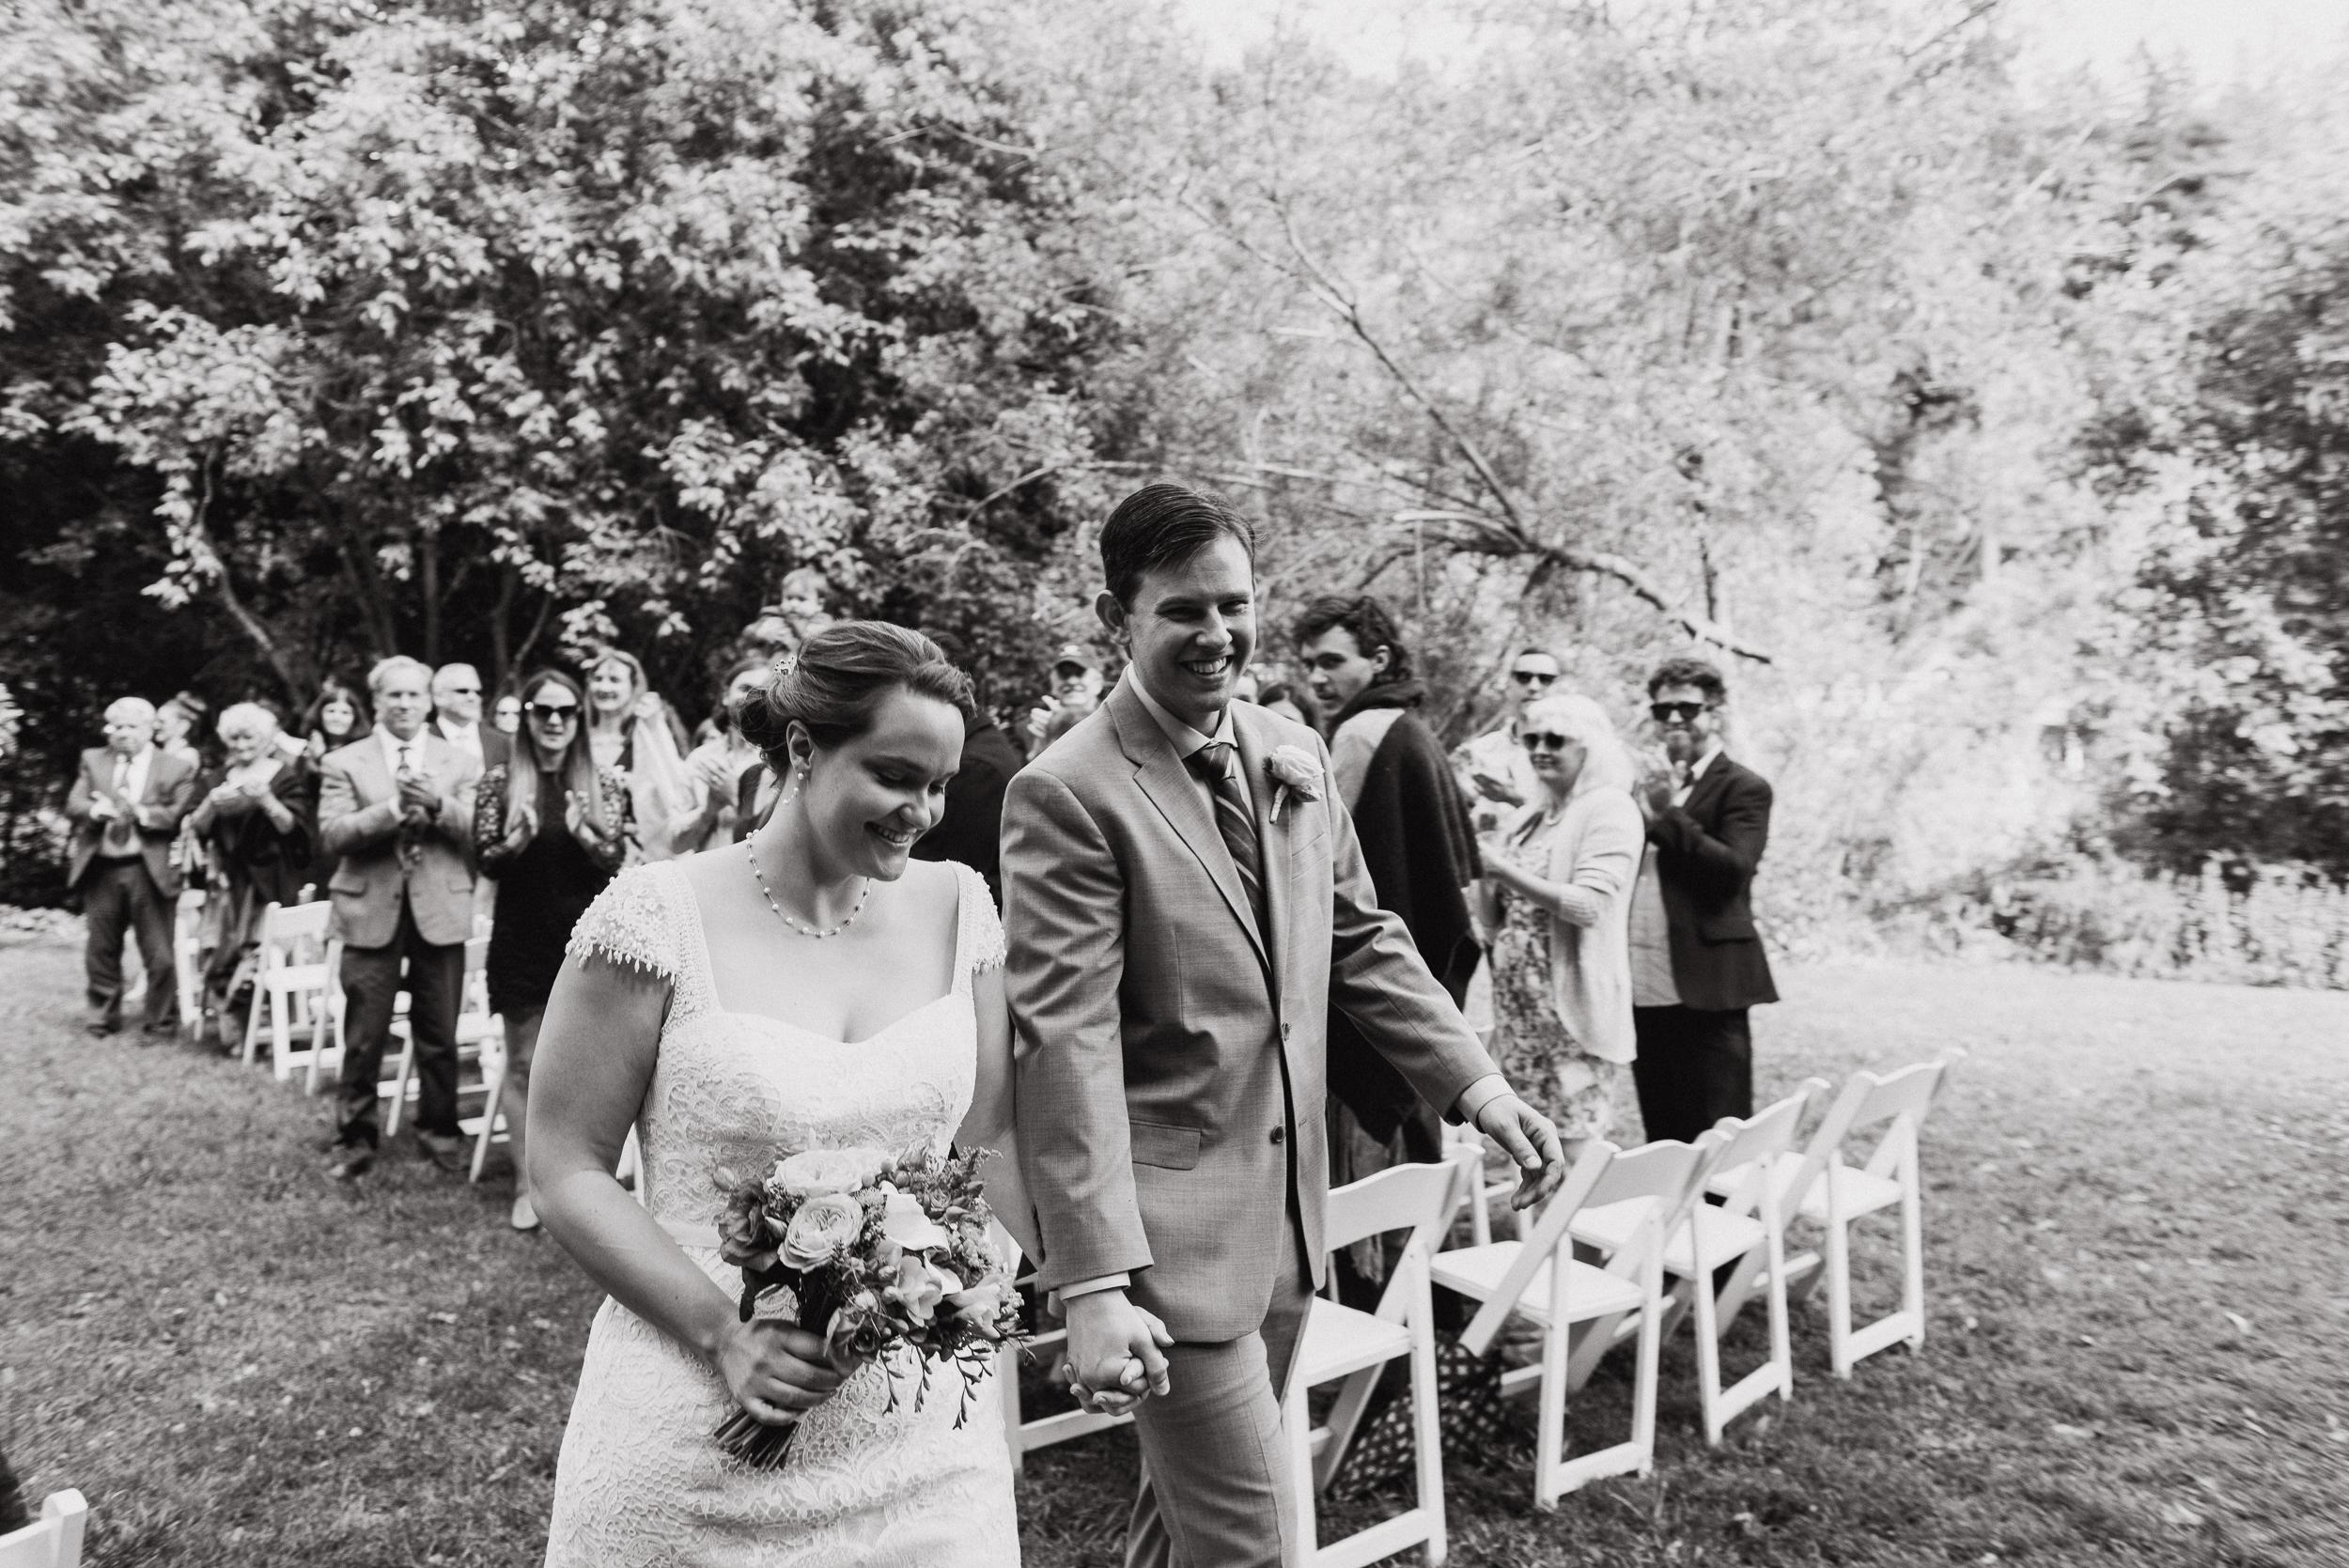 040-highland-dell-lodge-russian-river-wedding-vivianchen-229.jpg